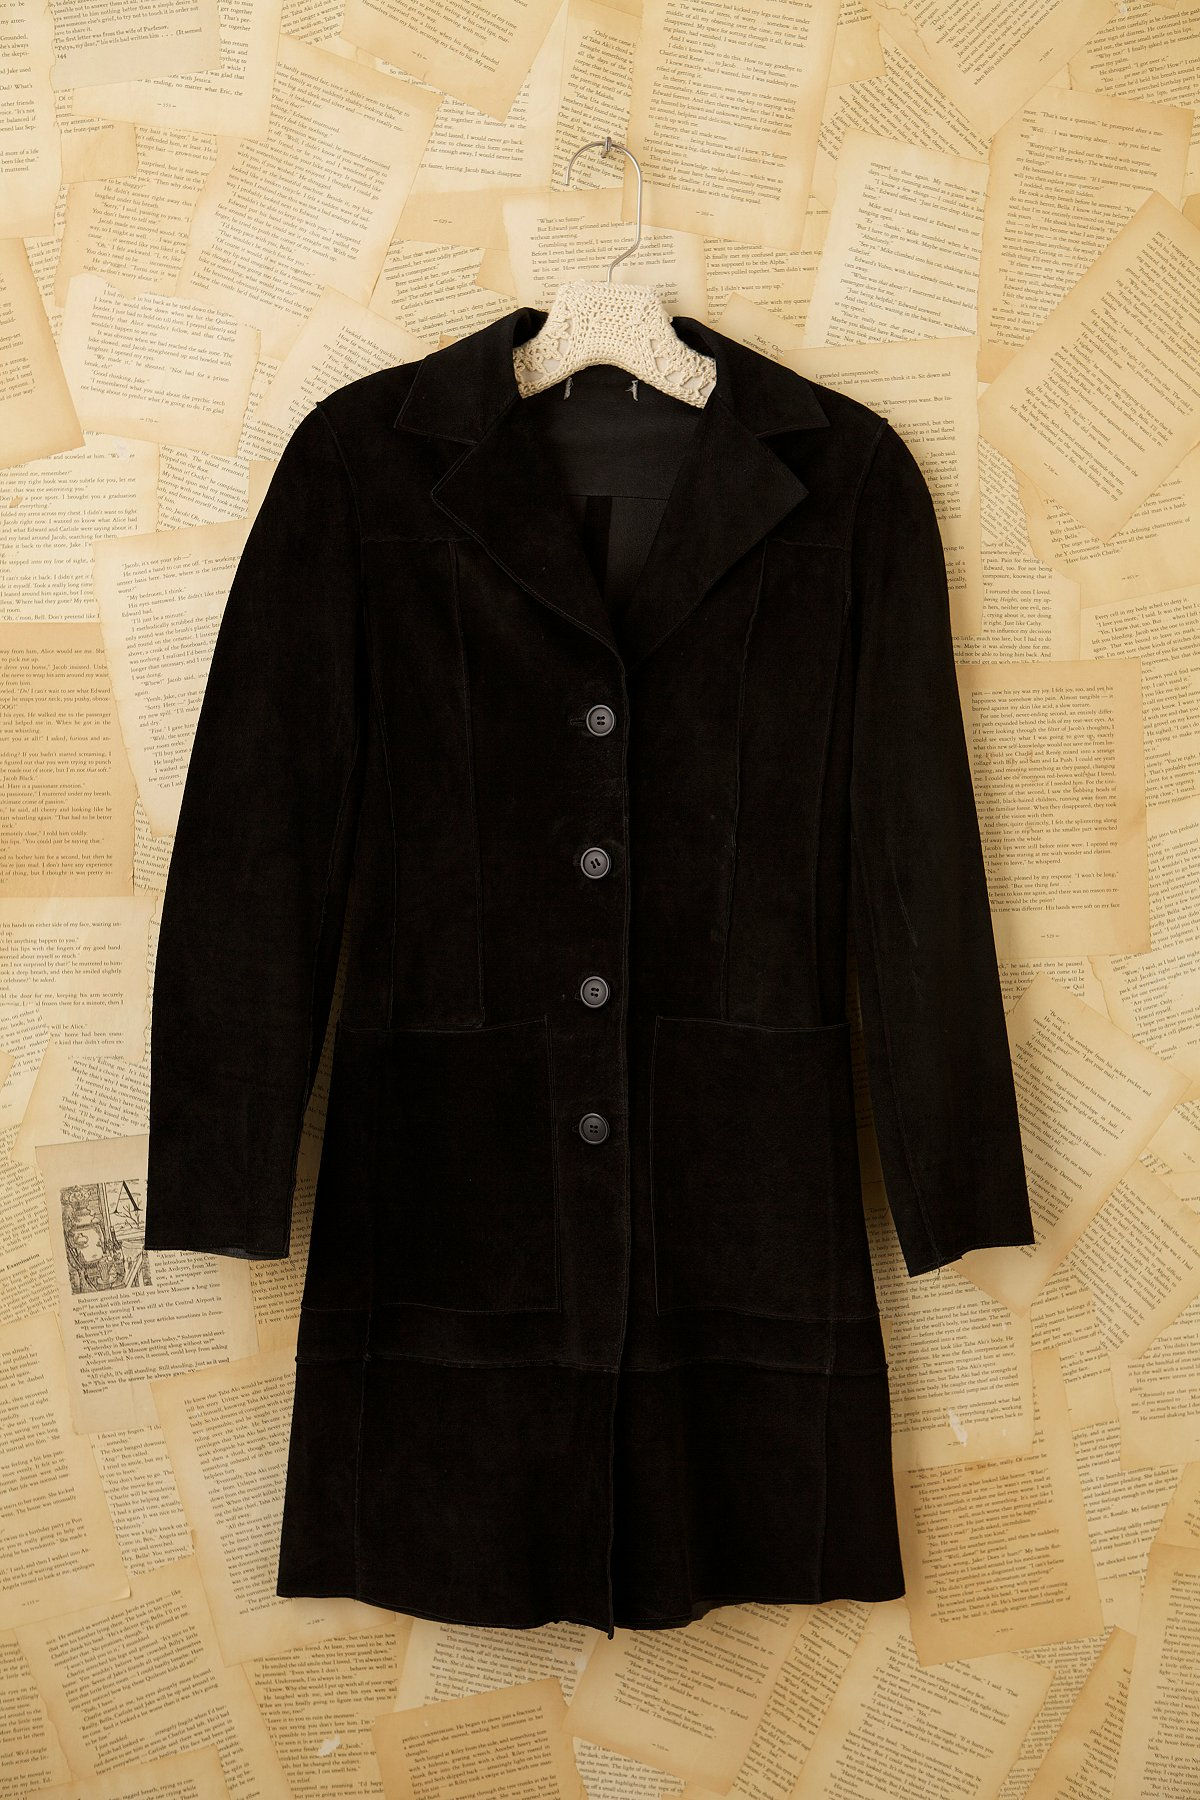 Vintage 70s Black Glove Leather Coat